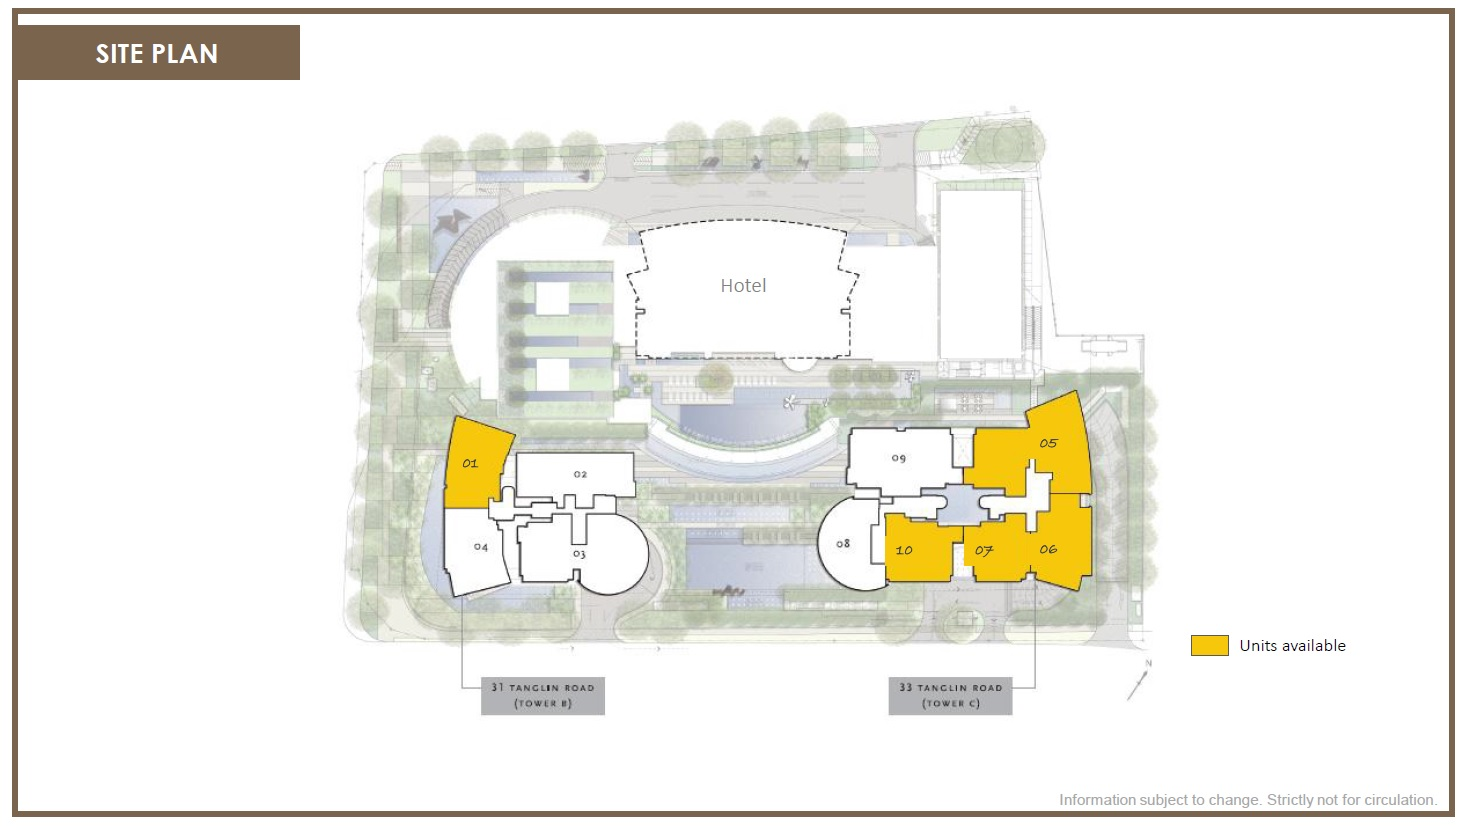 St. Regis Residences (瑞吉雅居) site plan